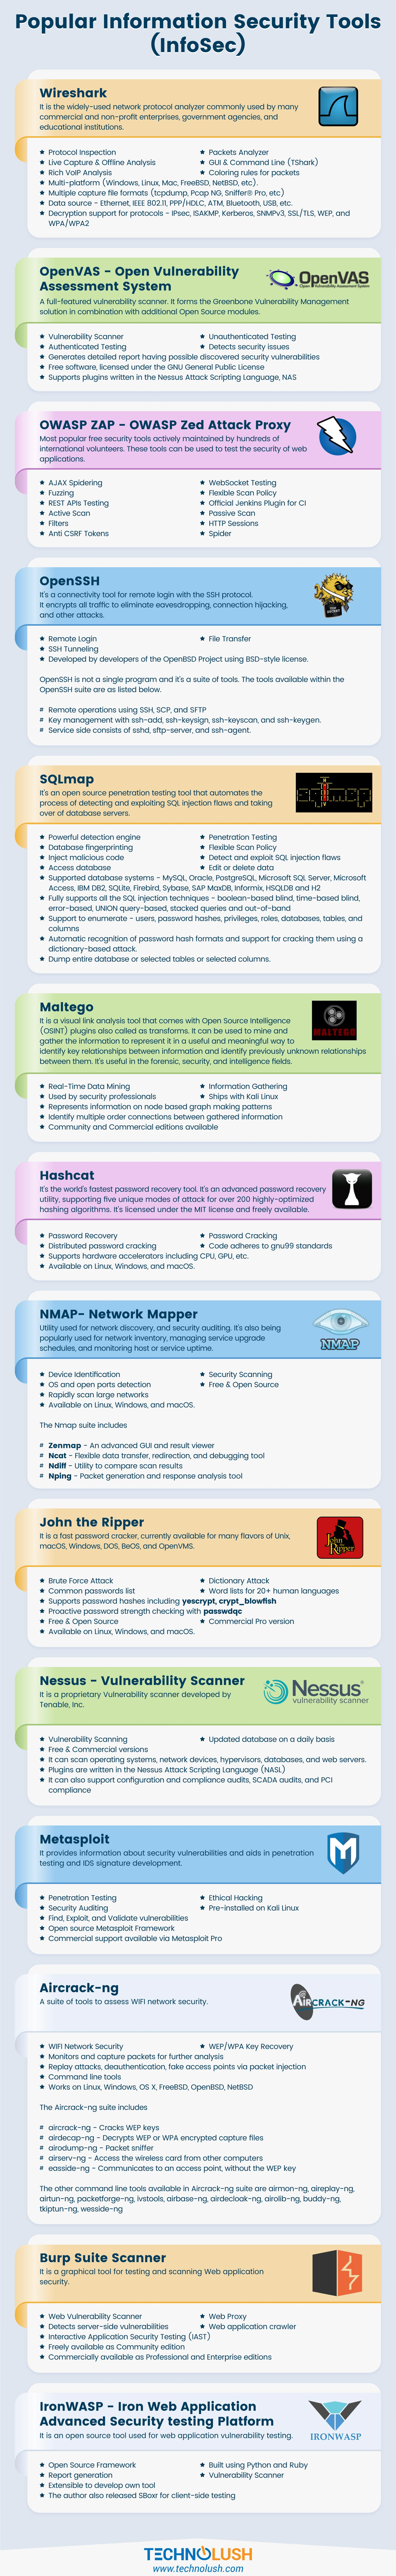 web application vulnerability testing tools